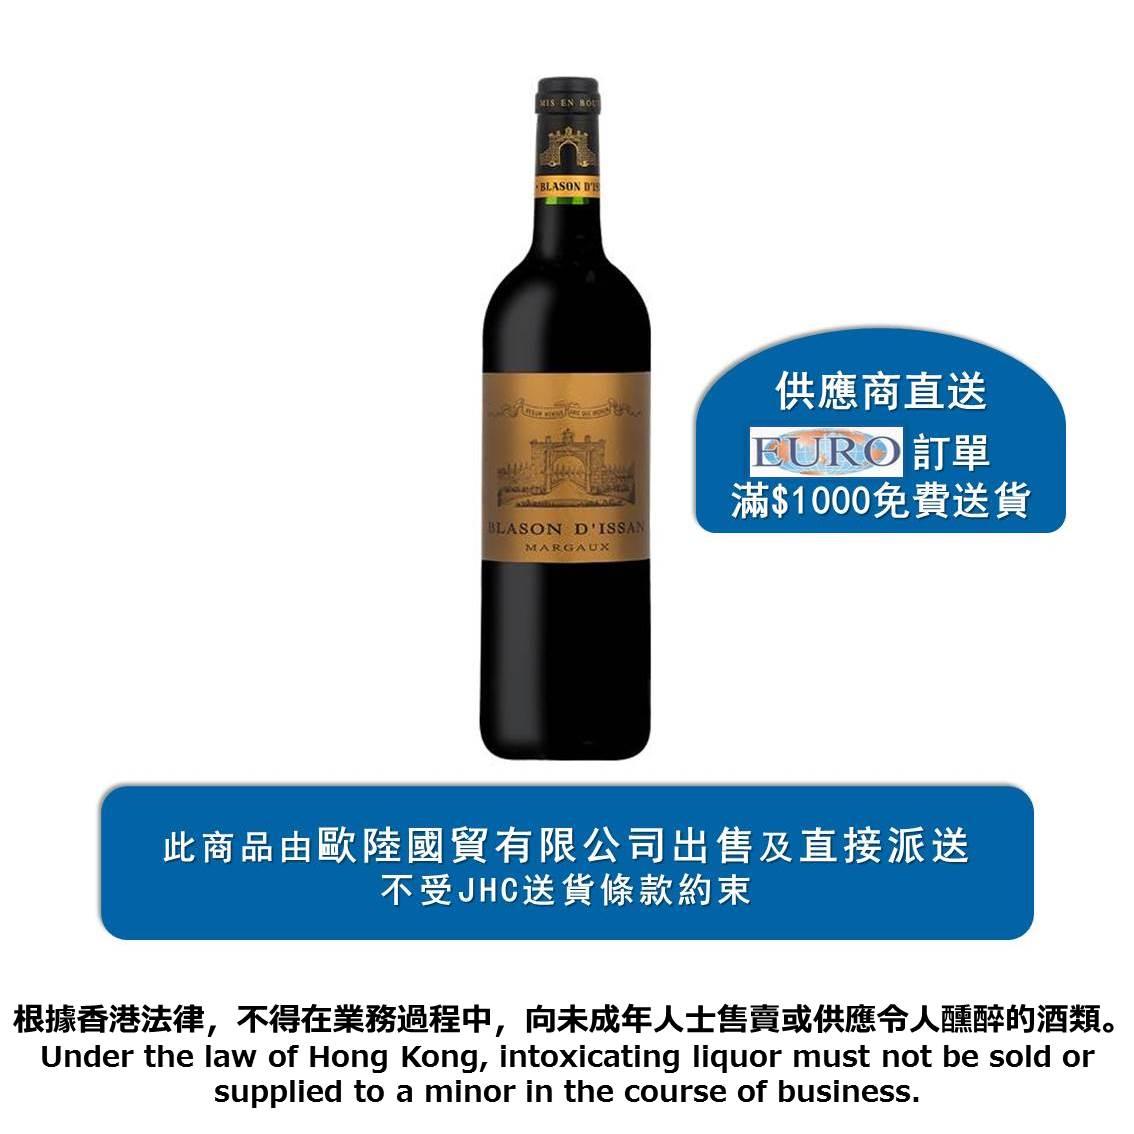 BLASON D'ISSAN葡萄酒 2013